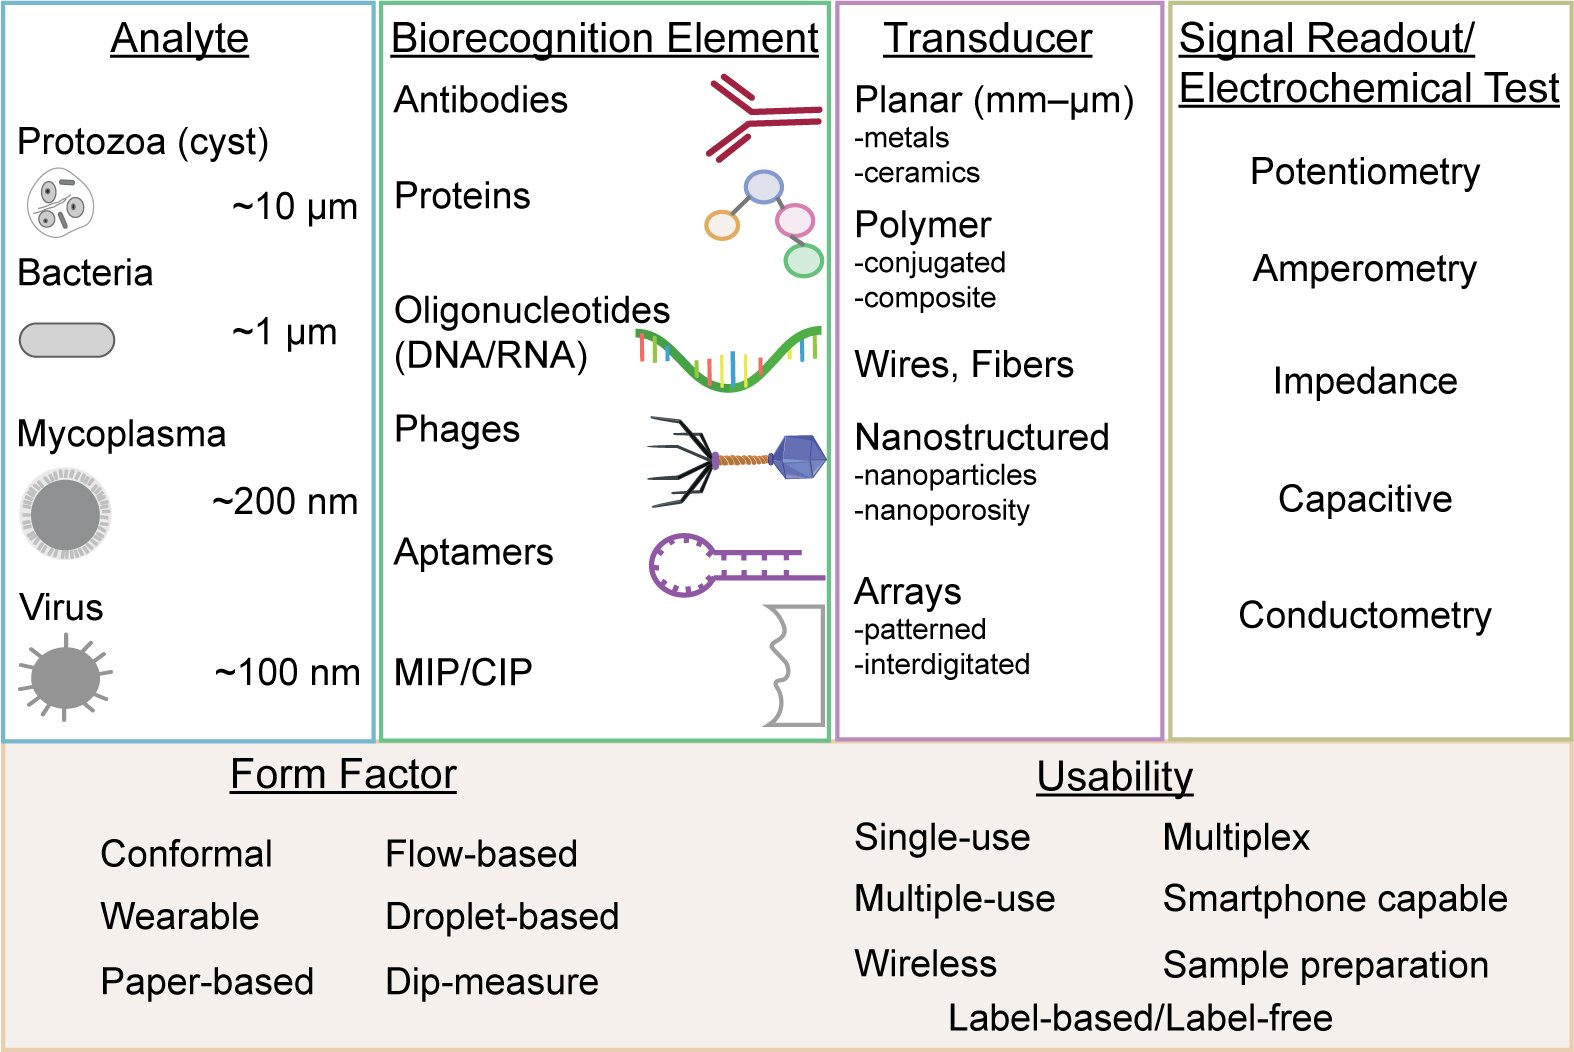 Electrochemical biosensors for pathogen detection, Biosensors and Bioelectronics, 159, 112214 (2020)